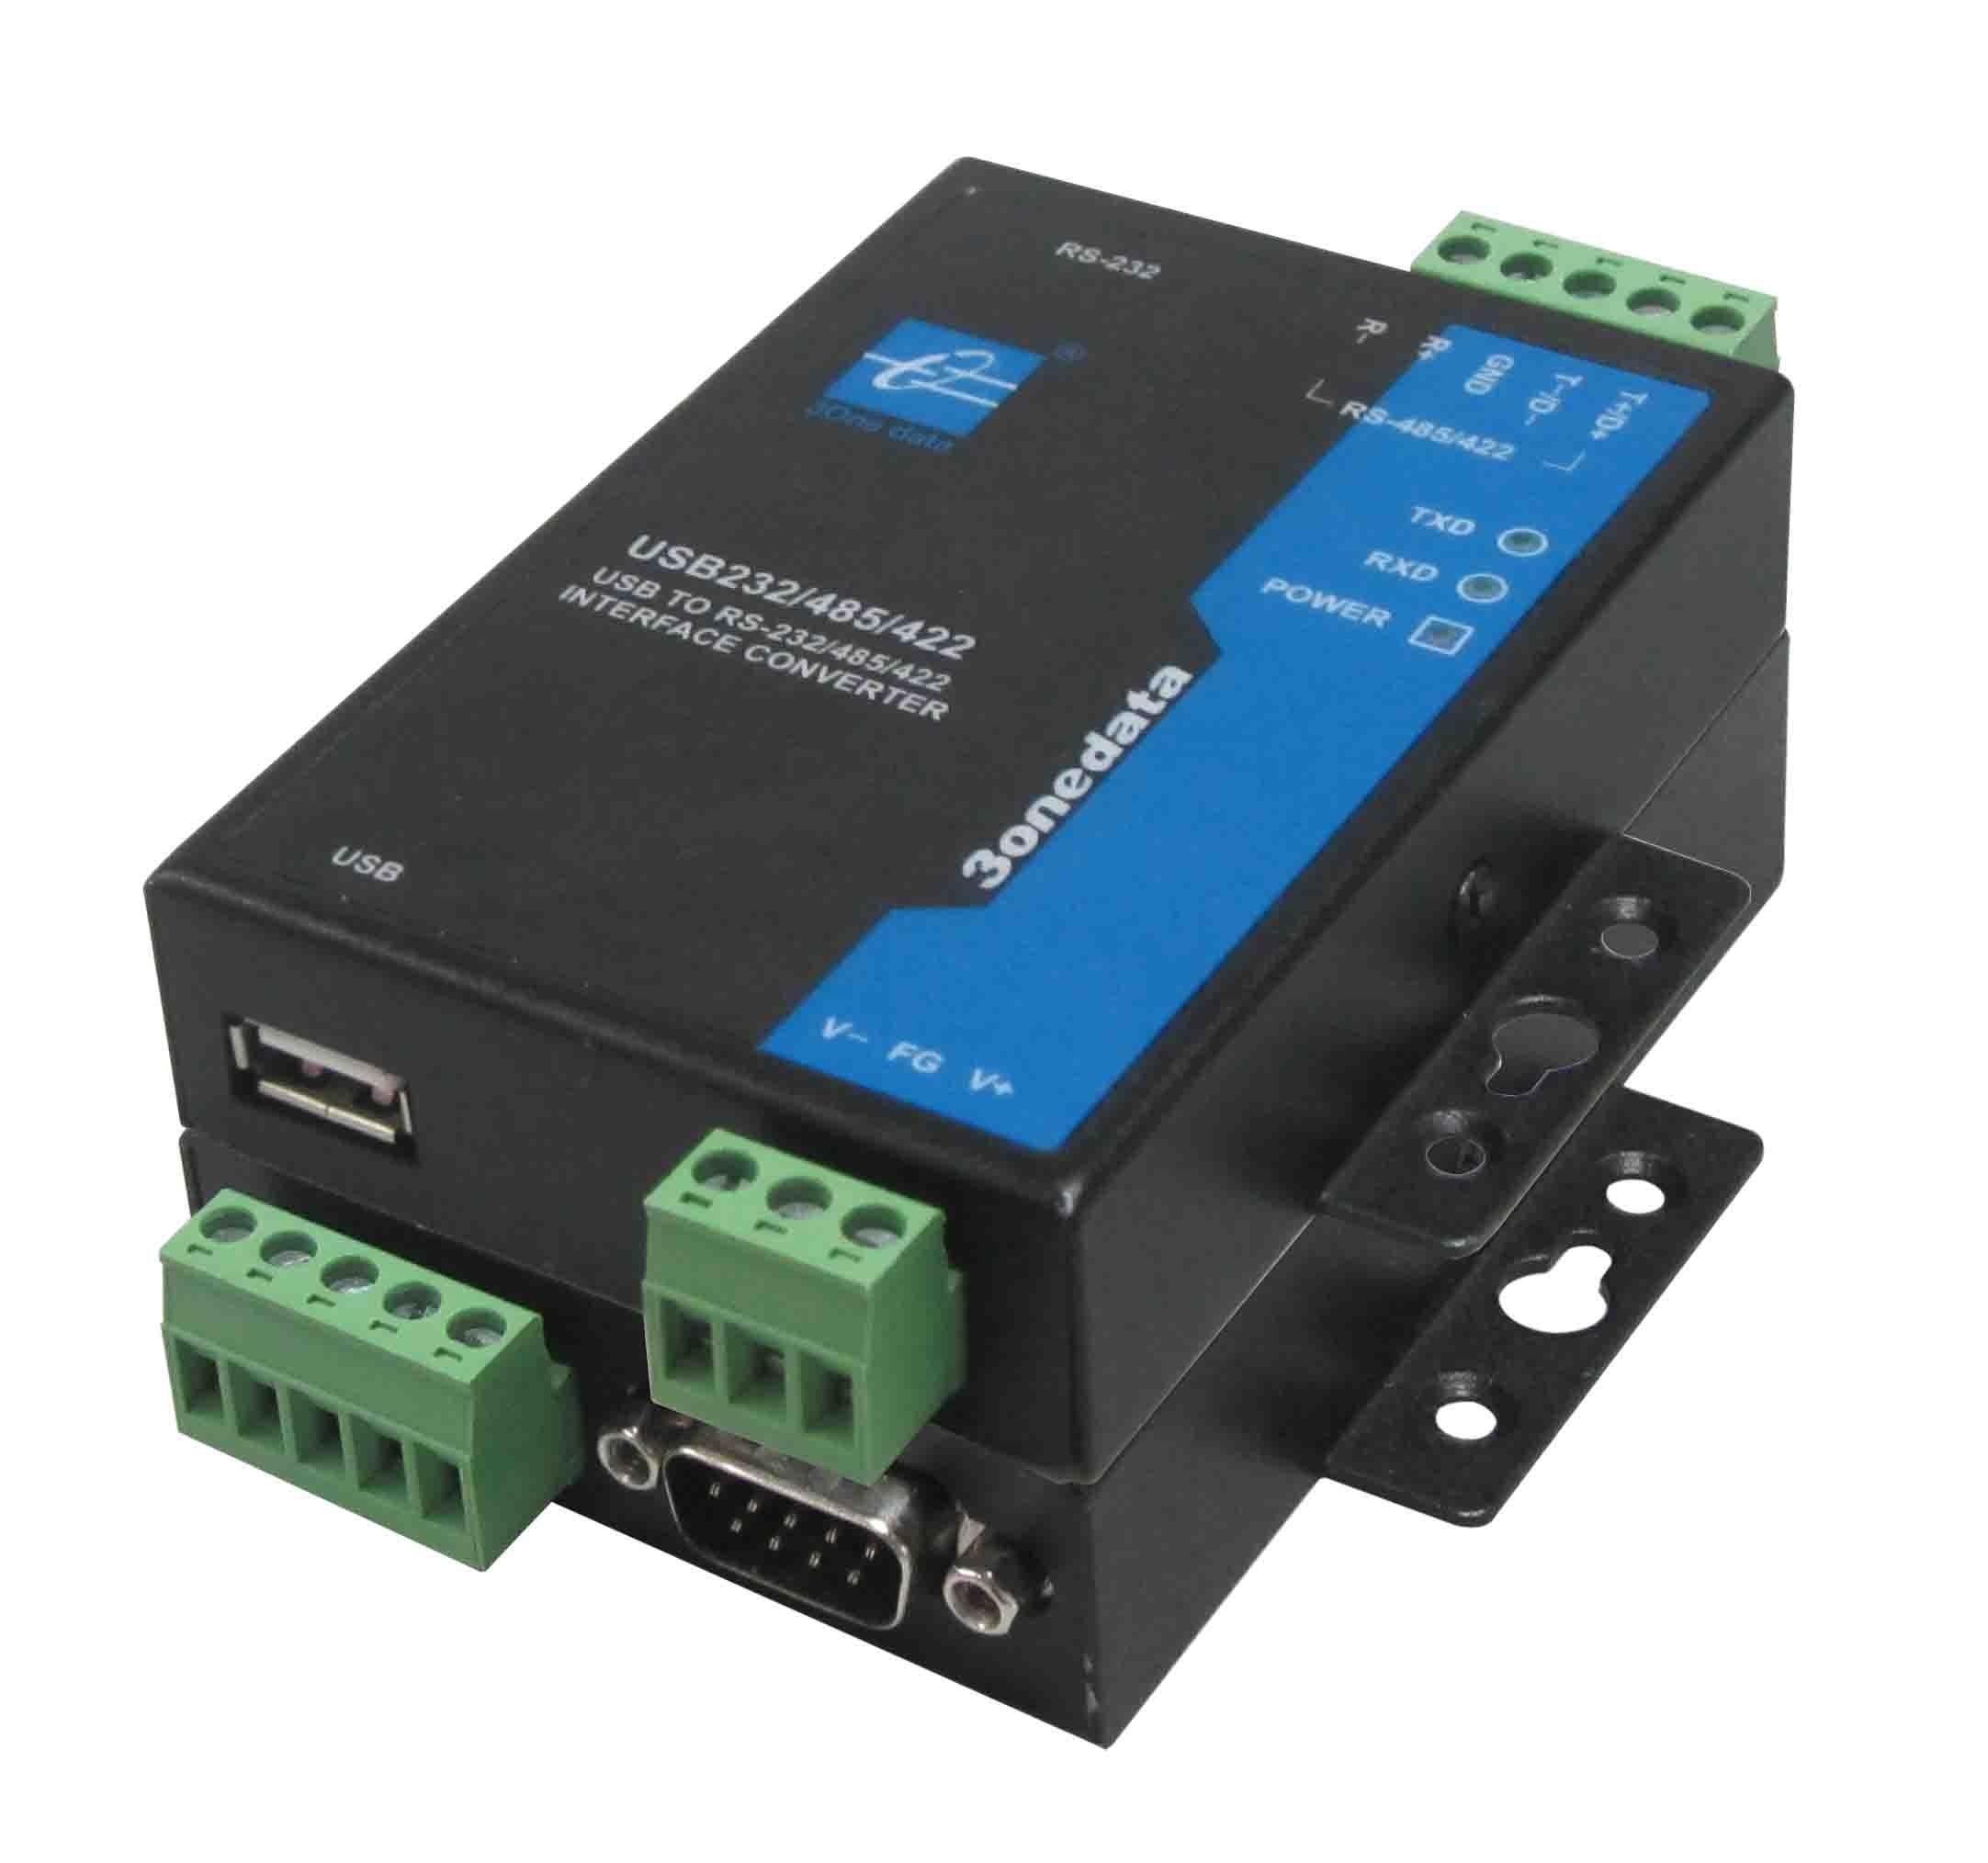 3onedata Interface Converter,1xUSB 2.0 TypeA to 1x RS232/422/485,-40+75C,Input 12VDC